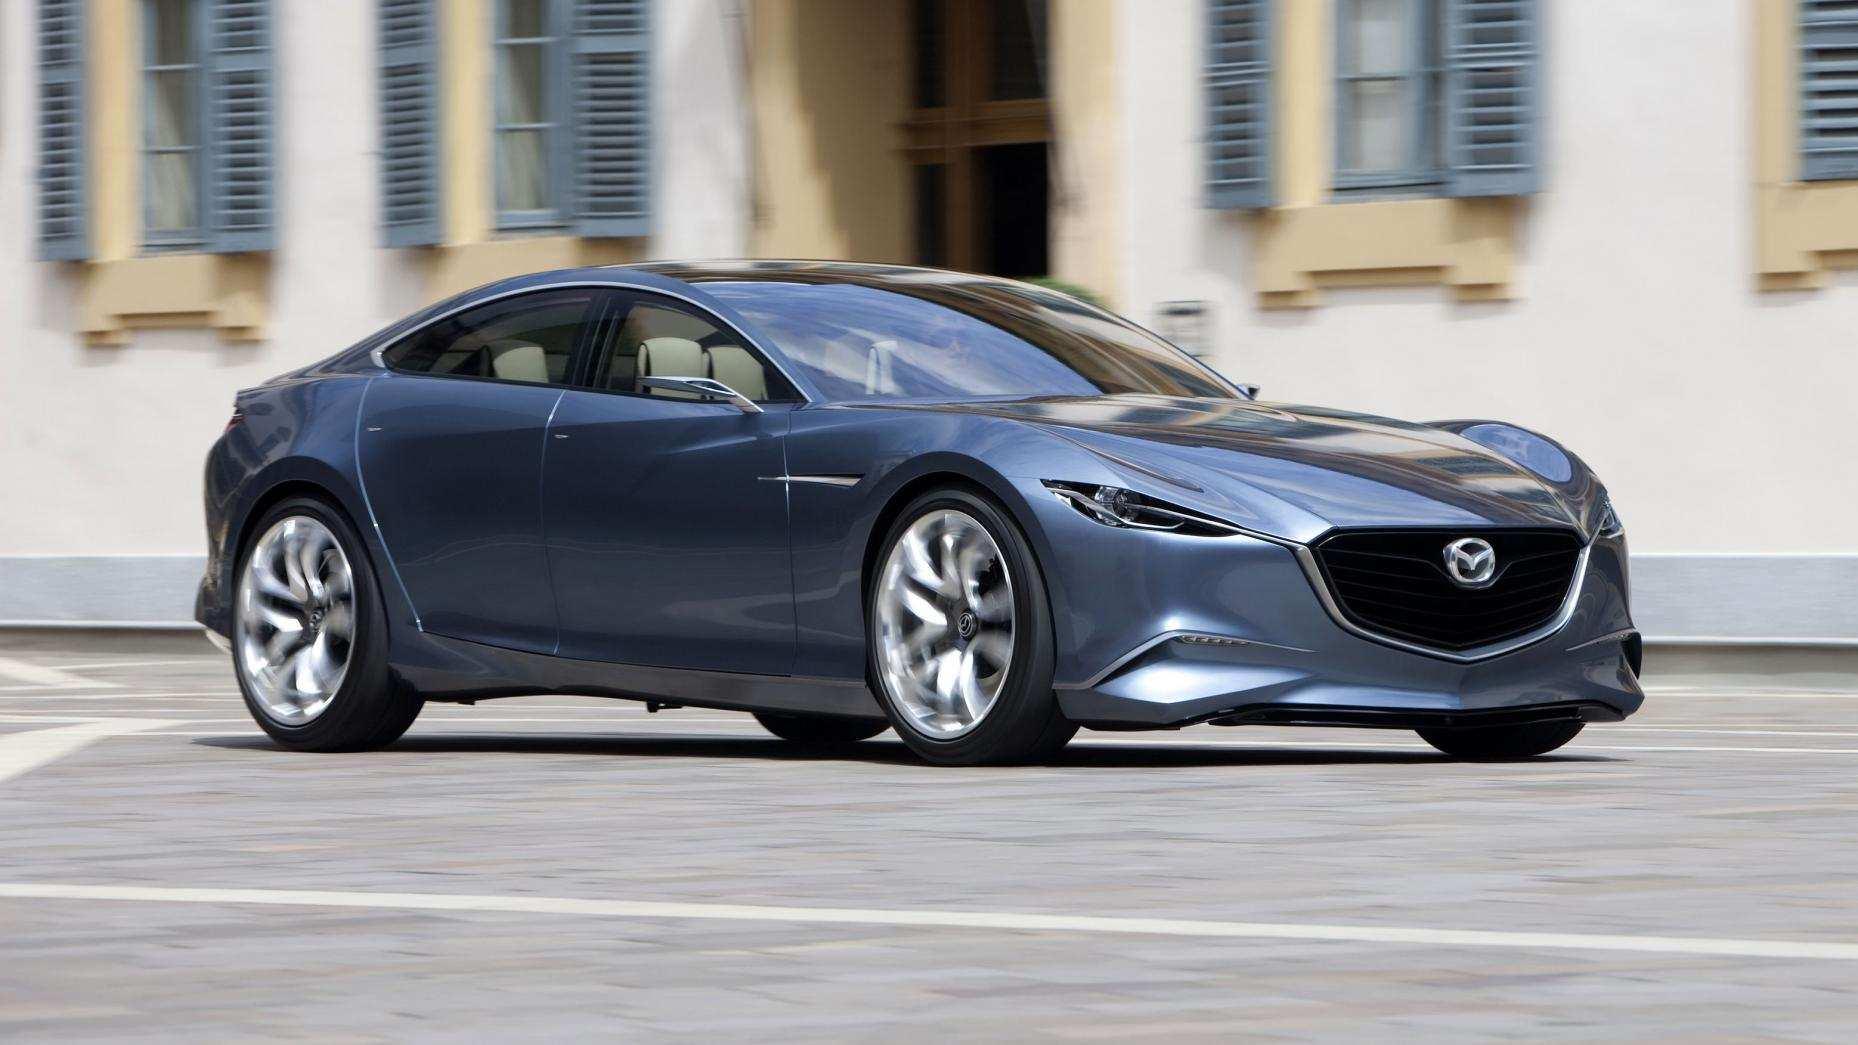 91 Concept of Mazda Kodo 2020 Research New with Mazda Kodo 2020